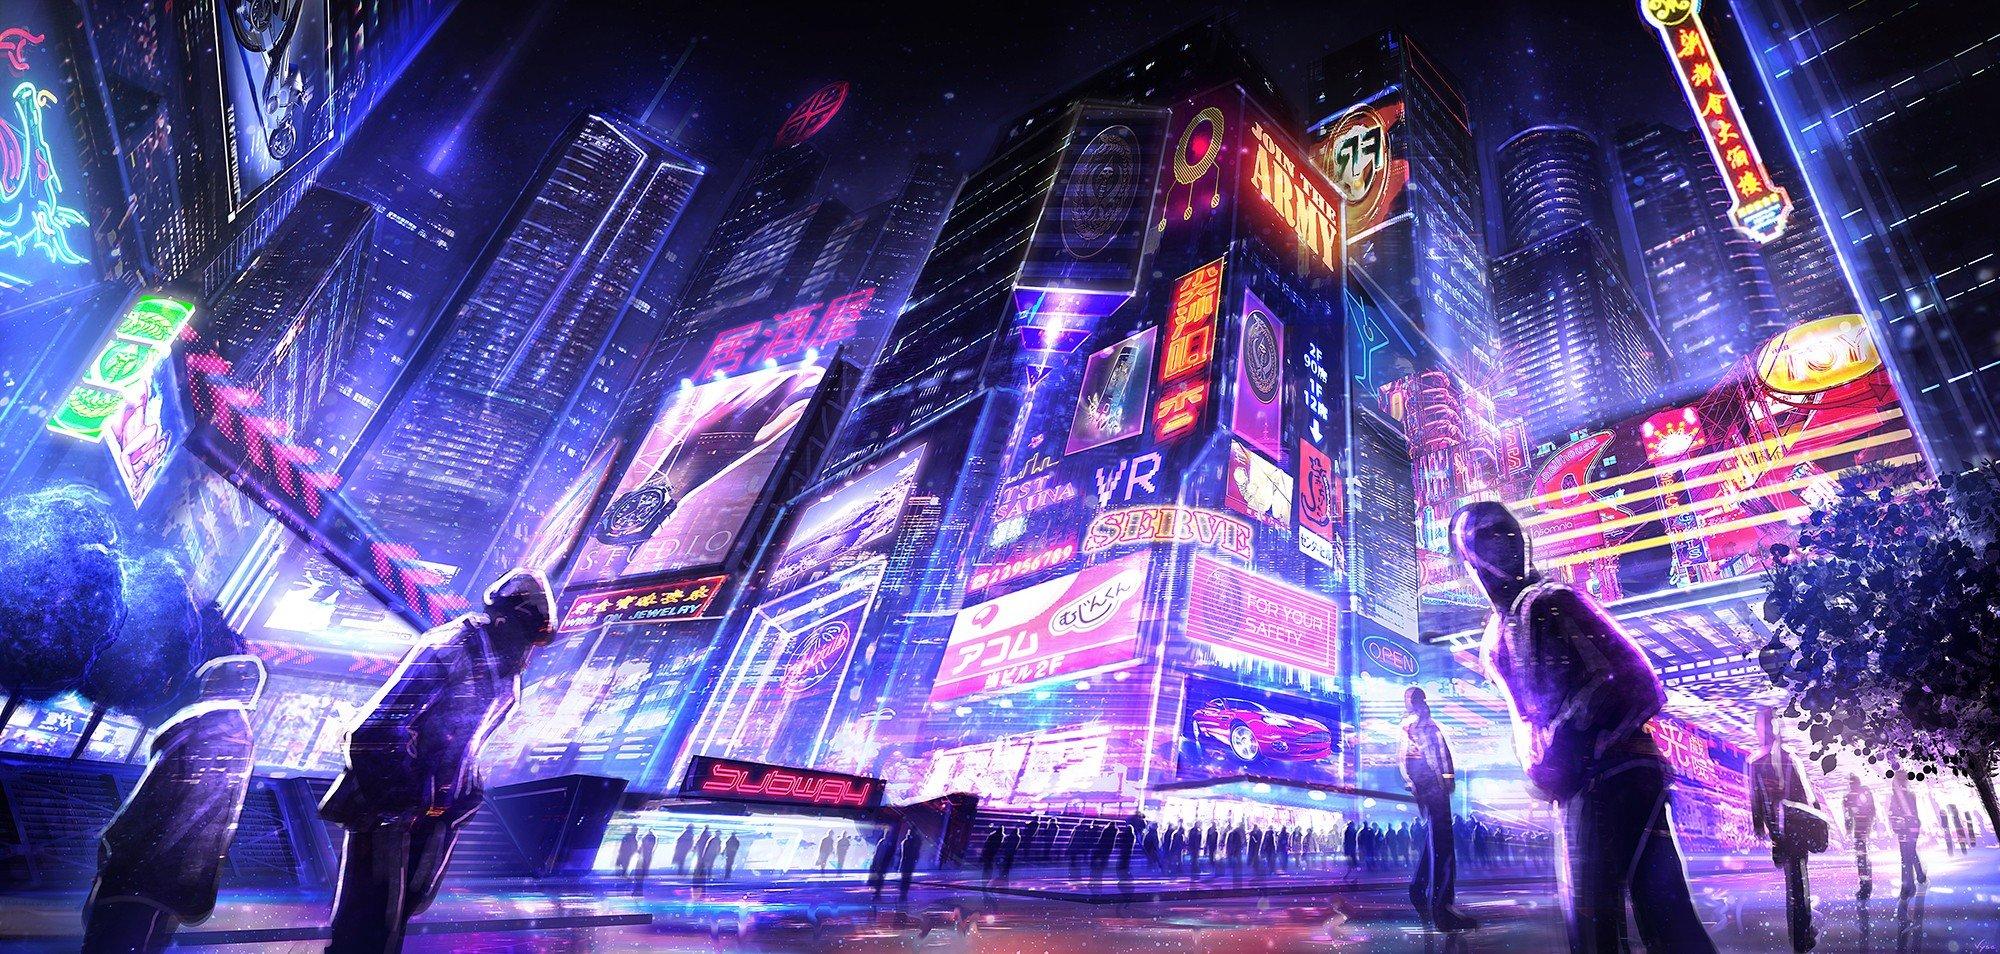 Cyberpunk, Futuristic, Neon HD Wallpapers / Desktop And